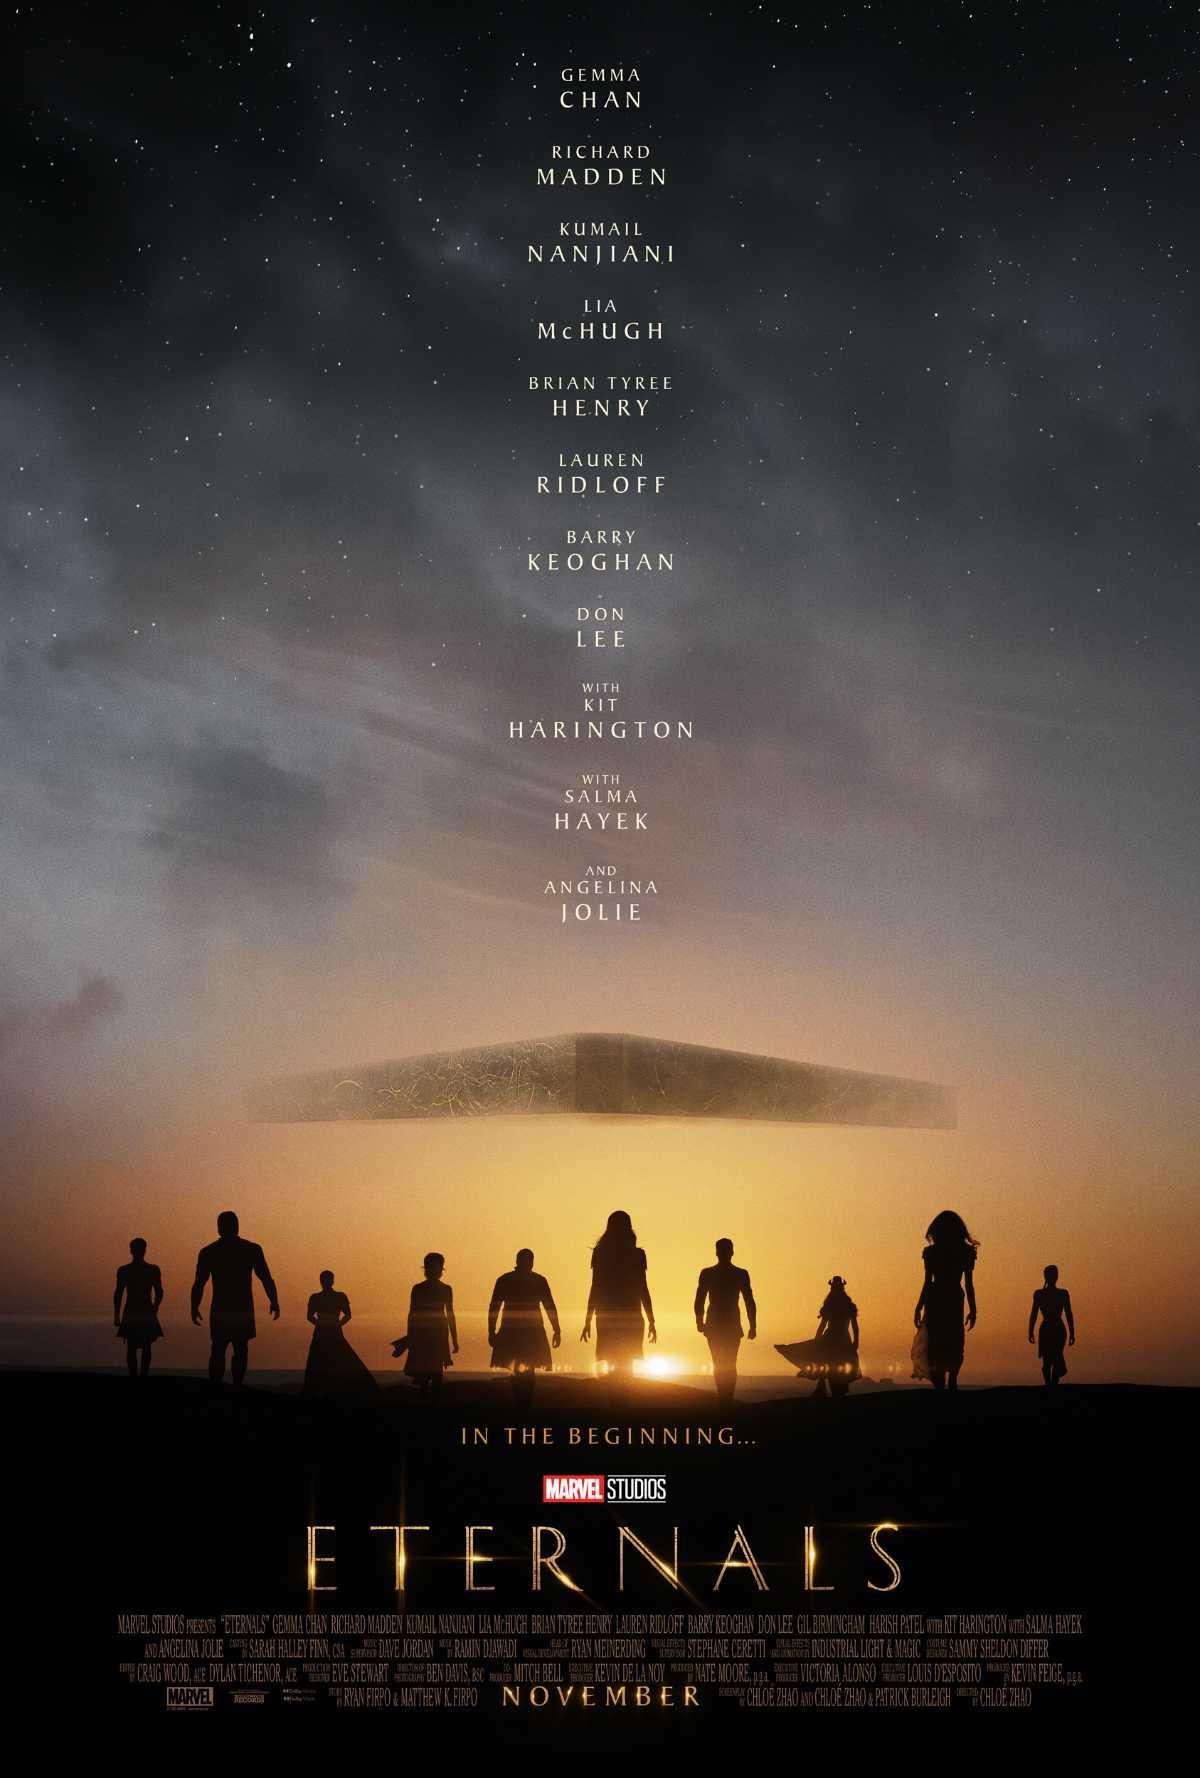 Eternals Teaser Trailer and Poster